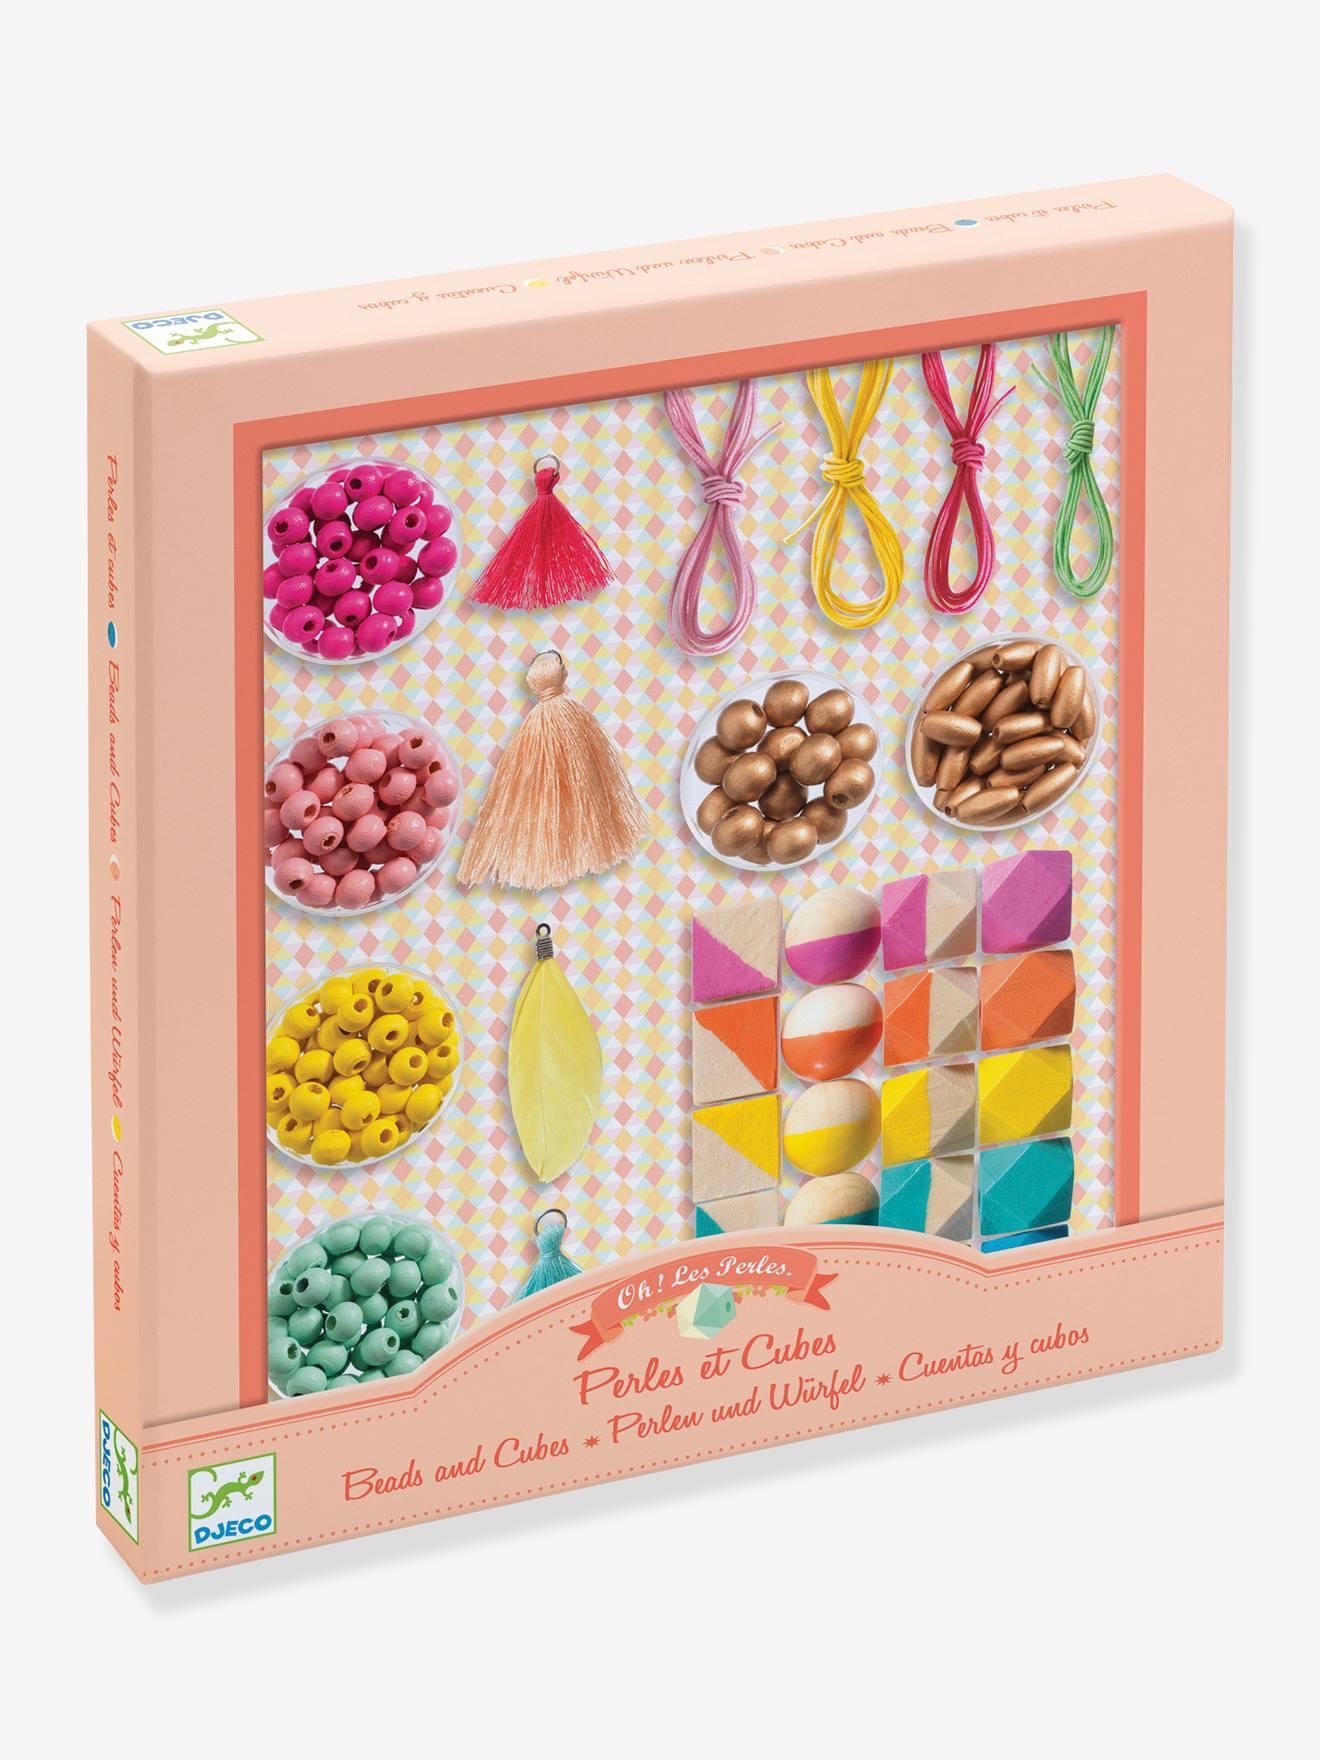 Coffret Perles et Cubes - DJECO multicolore